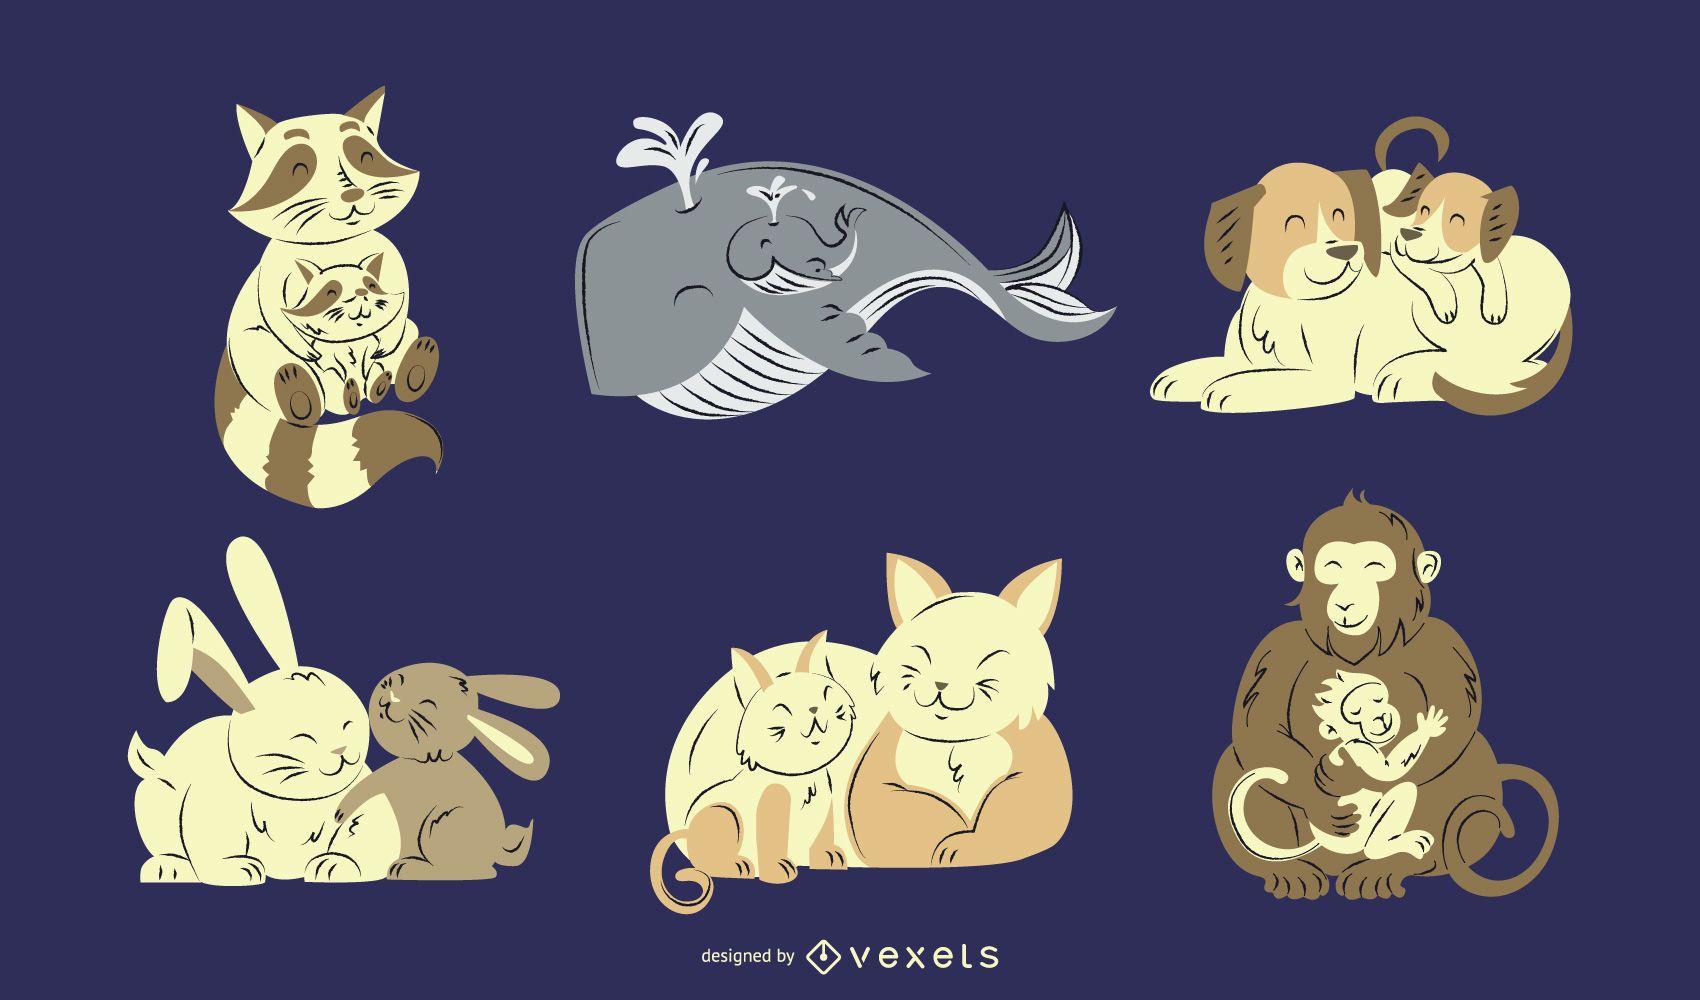 Animal dads and babies illustration set